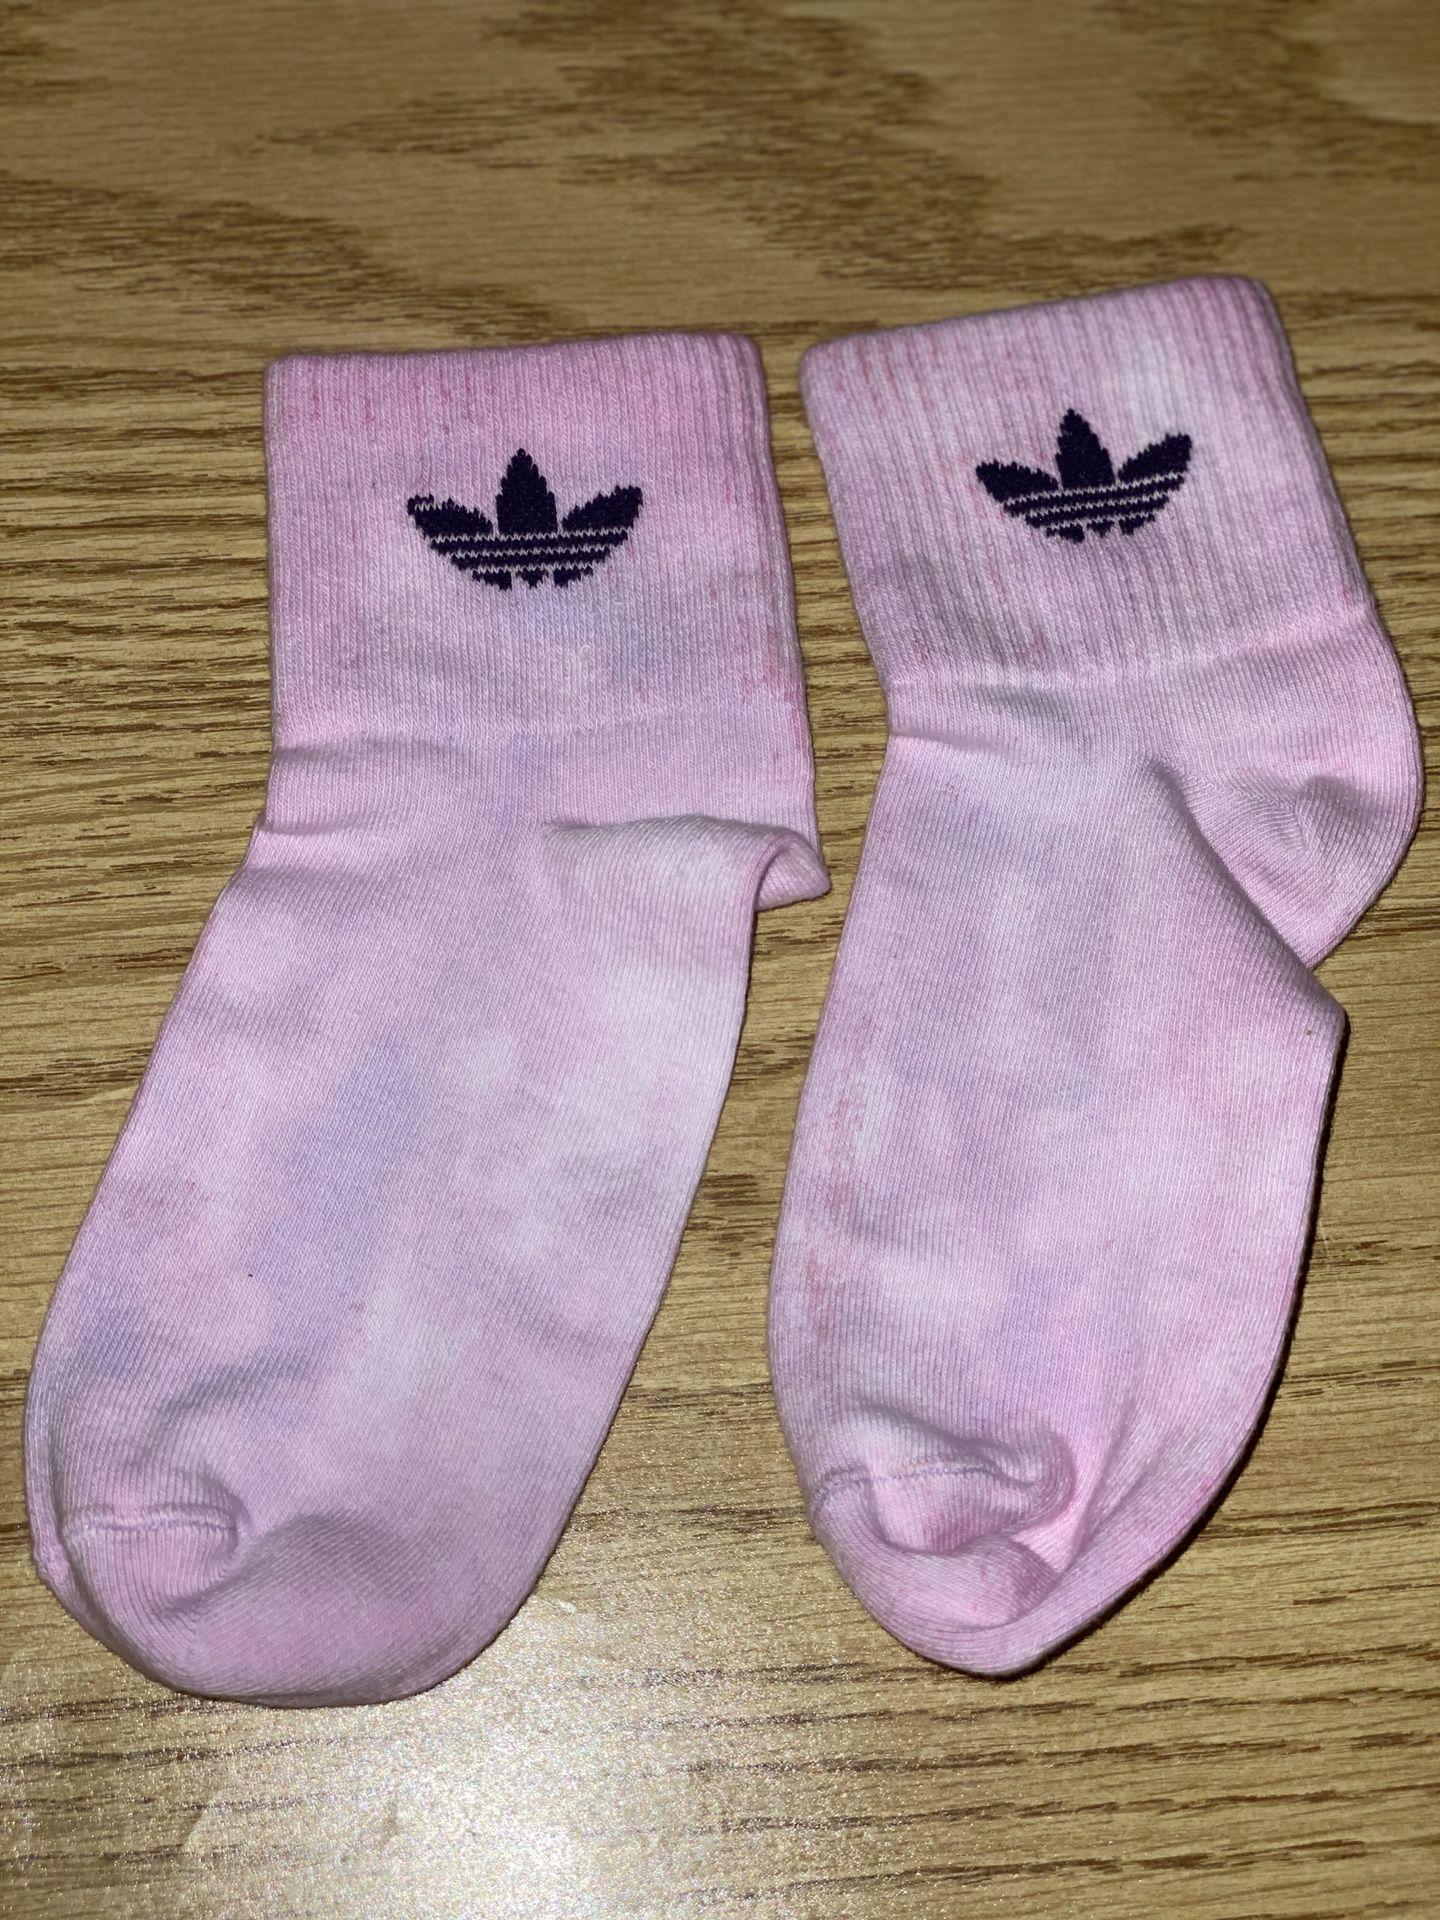 Adidas bleached socks